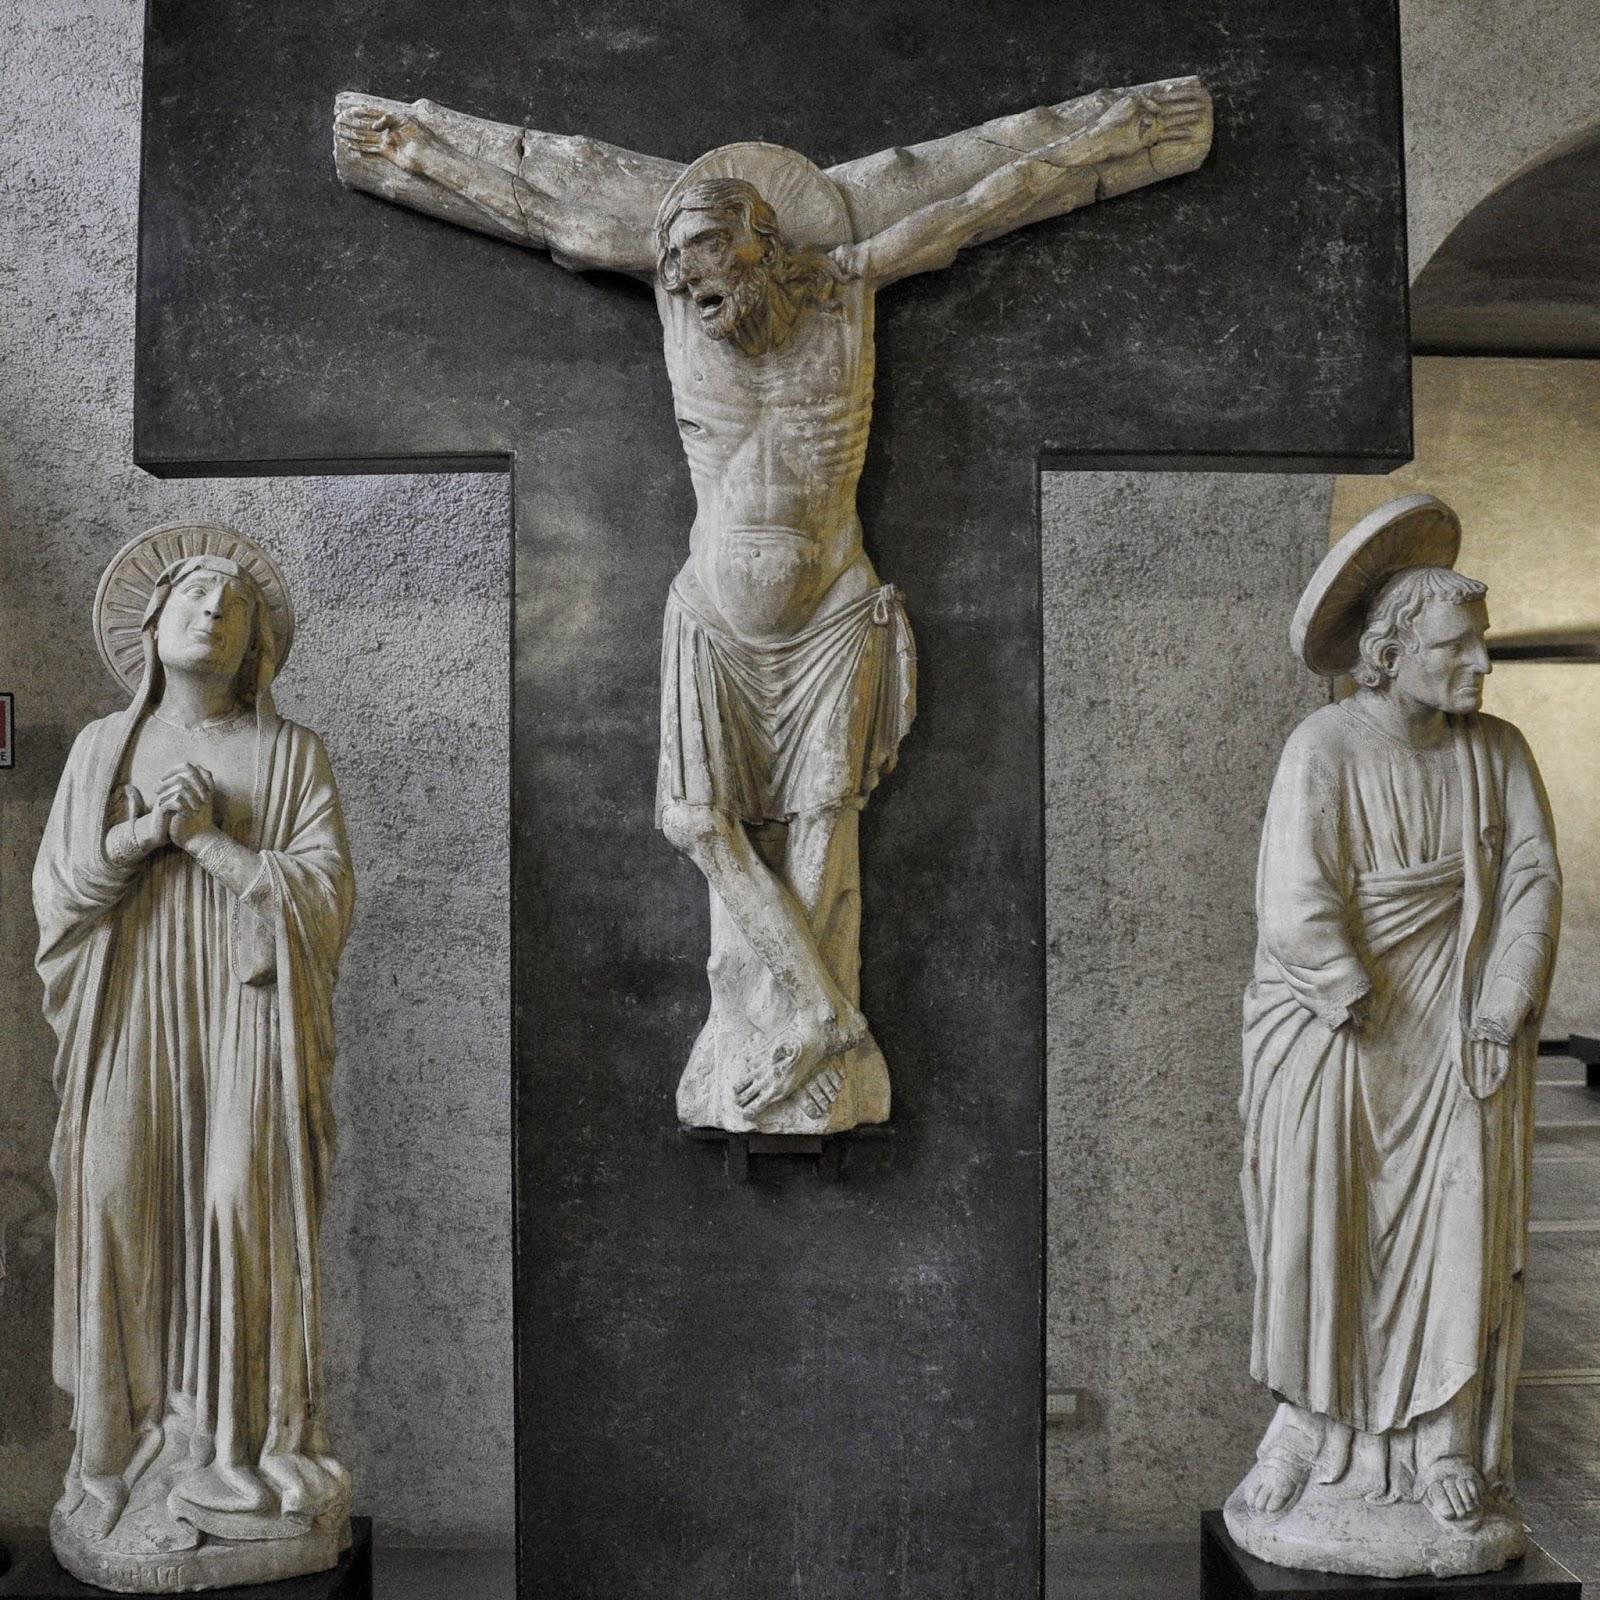 A medieval crucifixion in the Museum of Castelvecchio in Verona